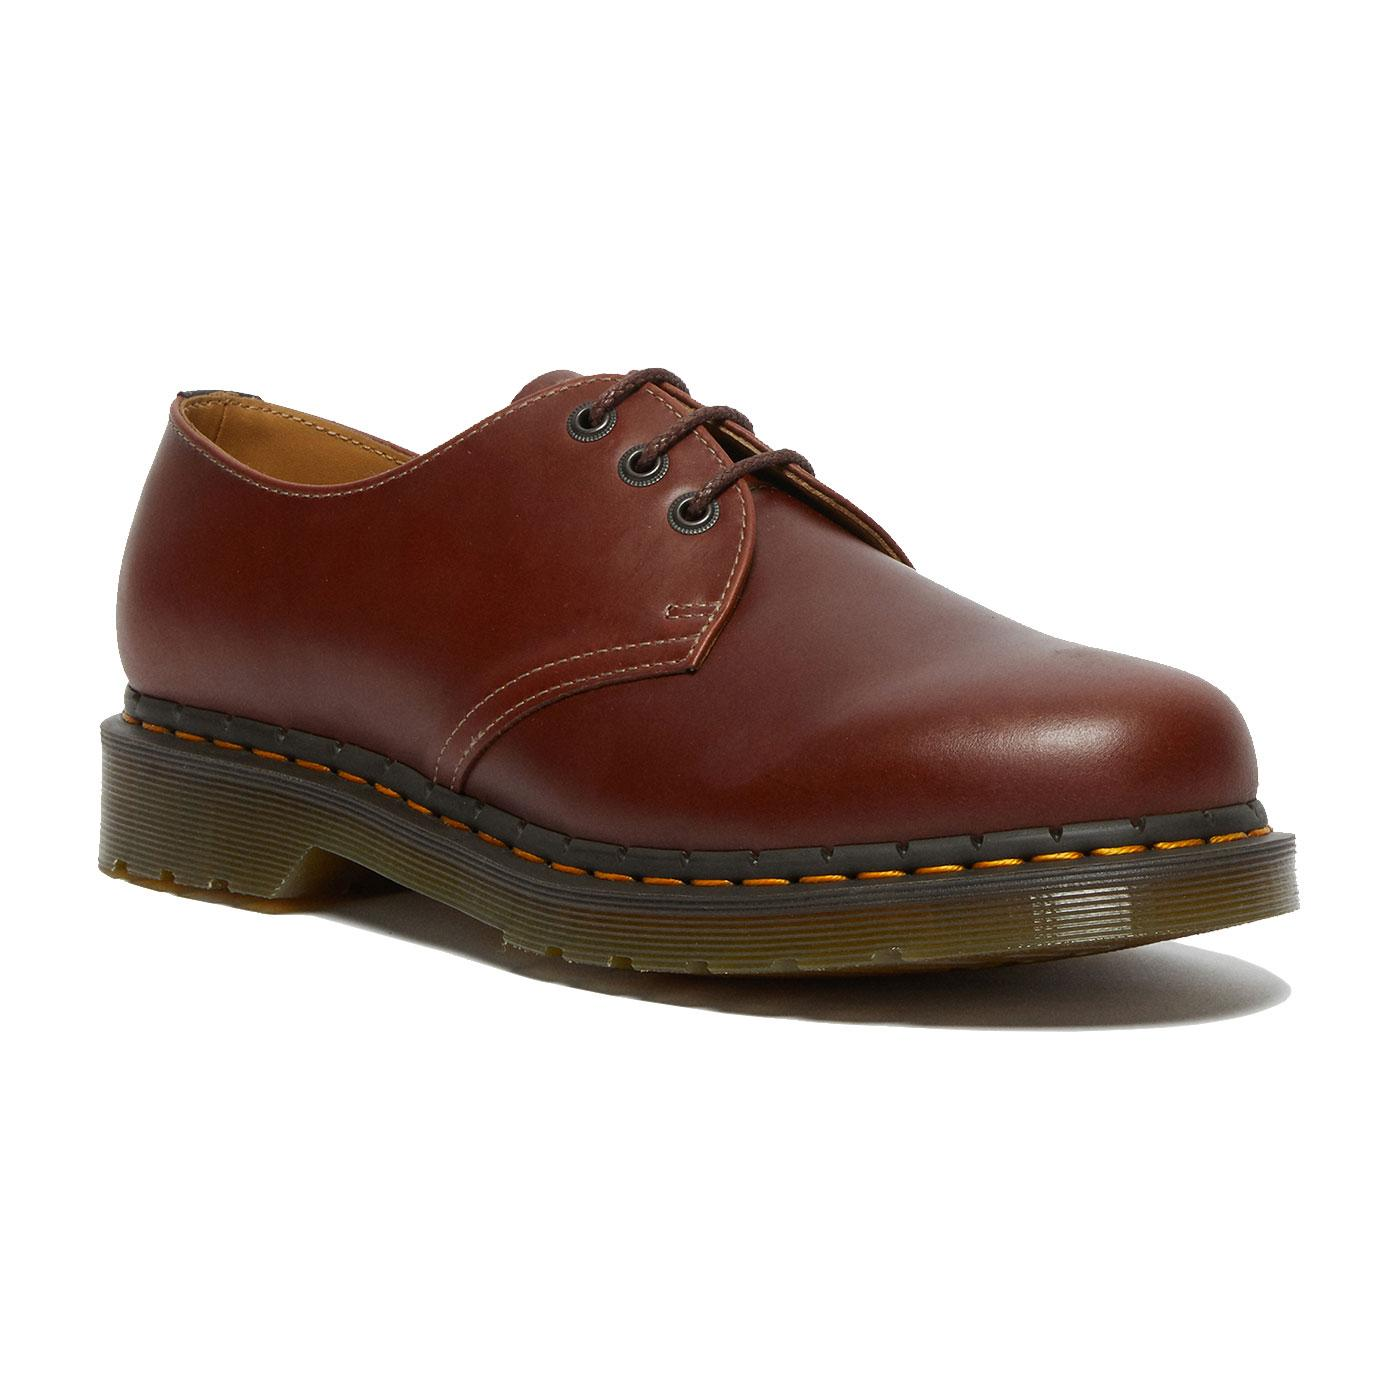 1461 Abruzzo WP DR MARTENS Mens Shoes Black/Brown